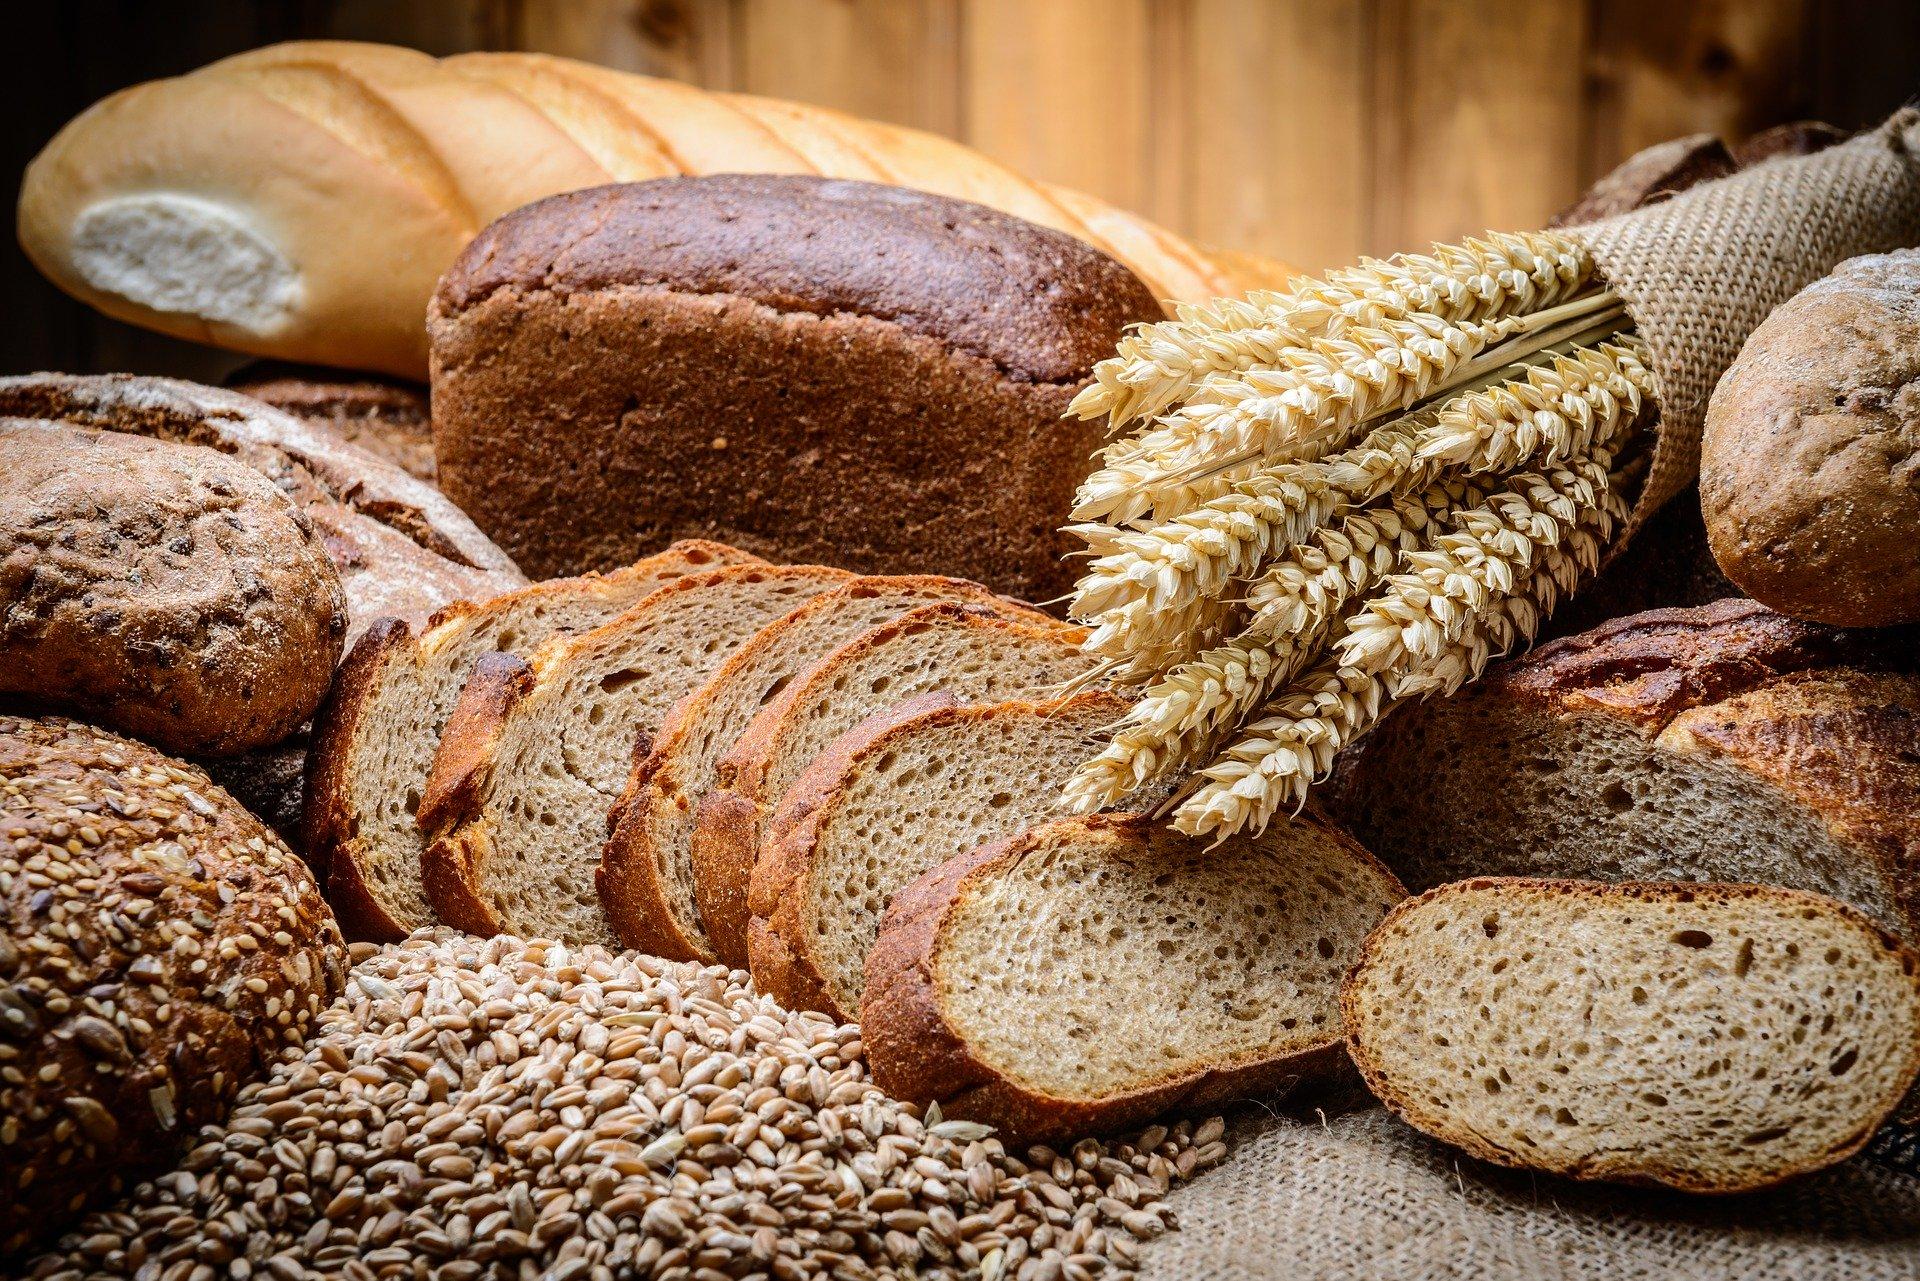 Iz domače kuhinje: Peka domačega kruha